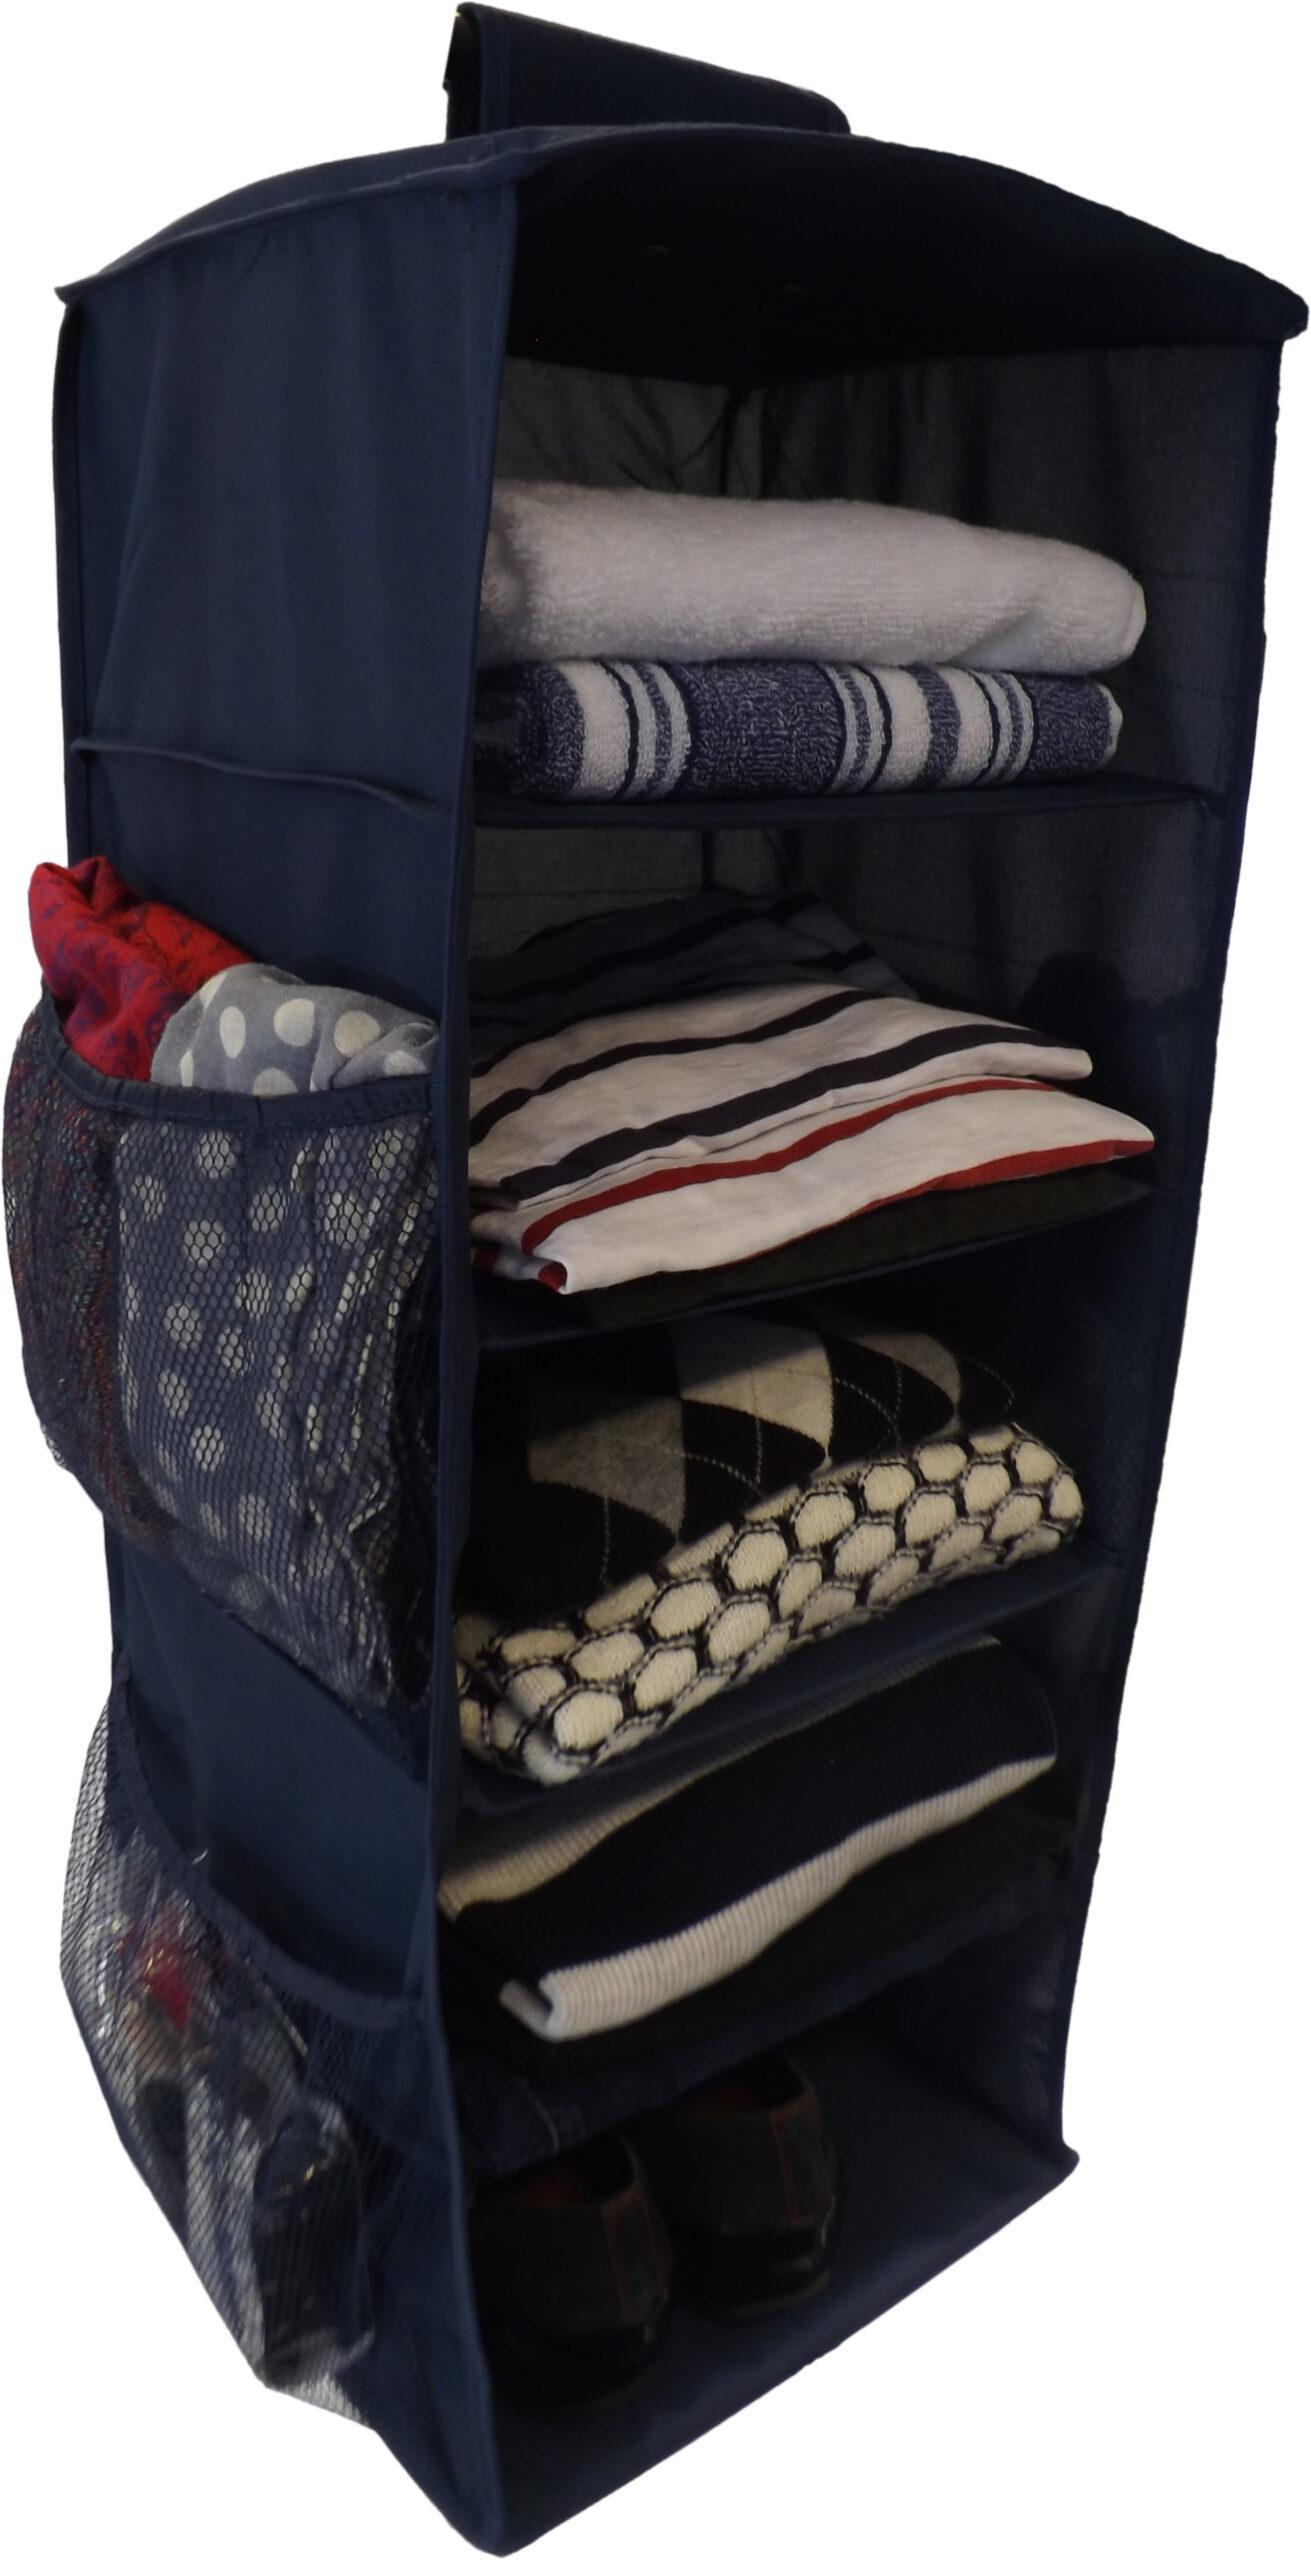 Hanging Wardrobe Organiser, Heavy Duty, 5 Shelves, 76x30x30cm, Blue